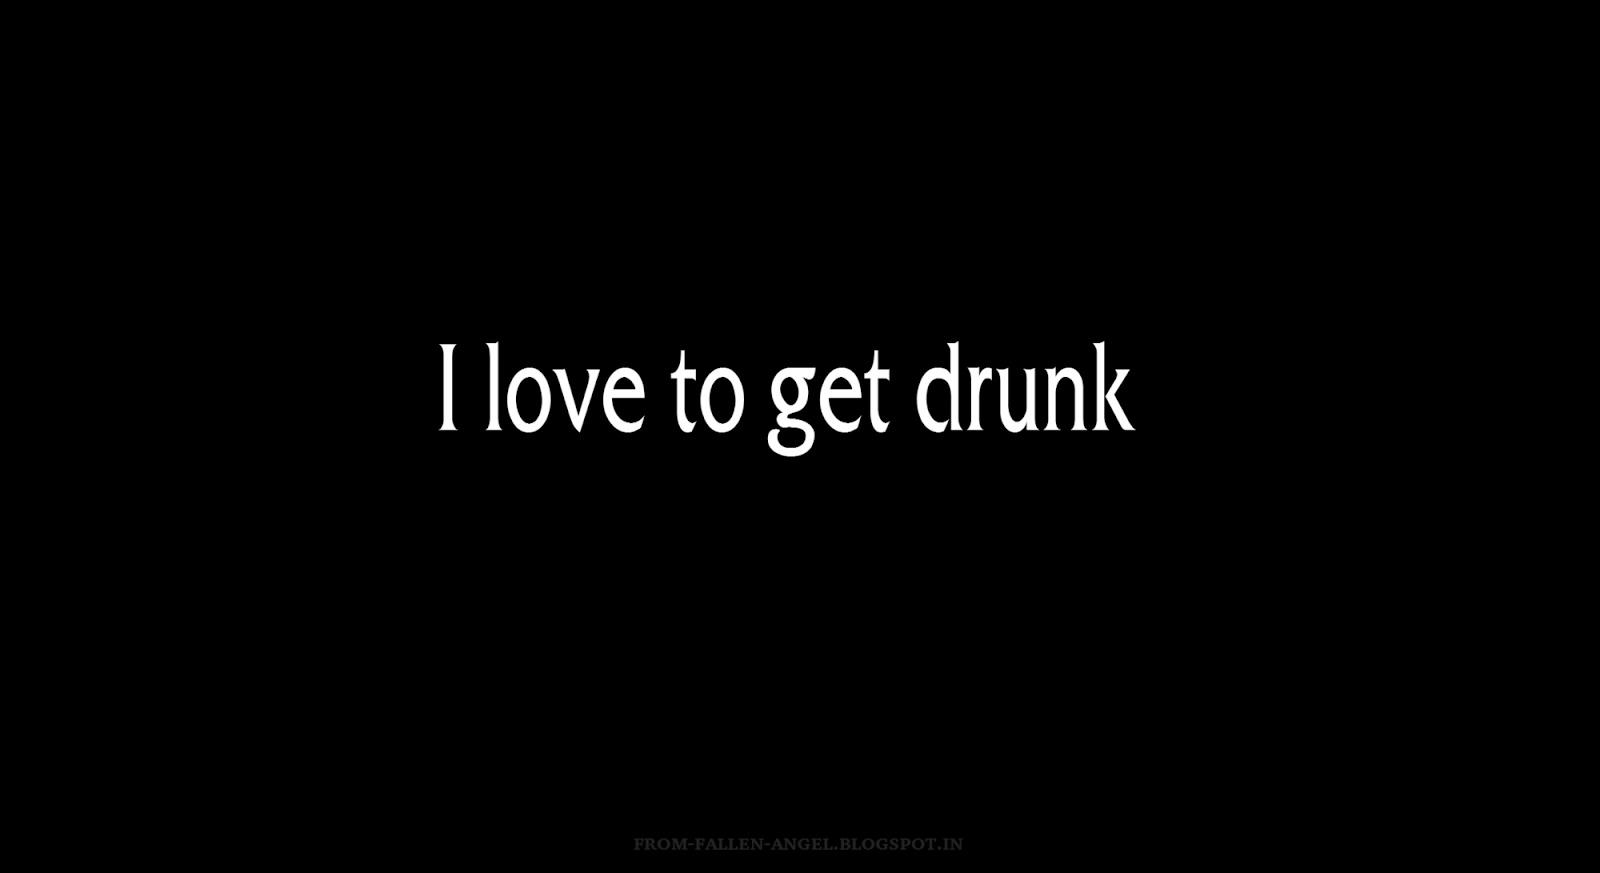 I love to get drunk